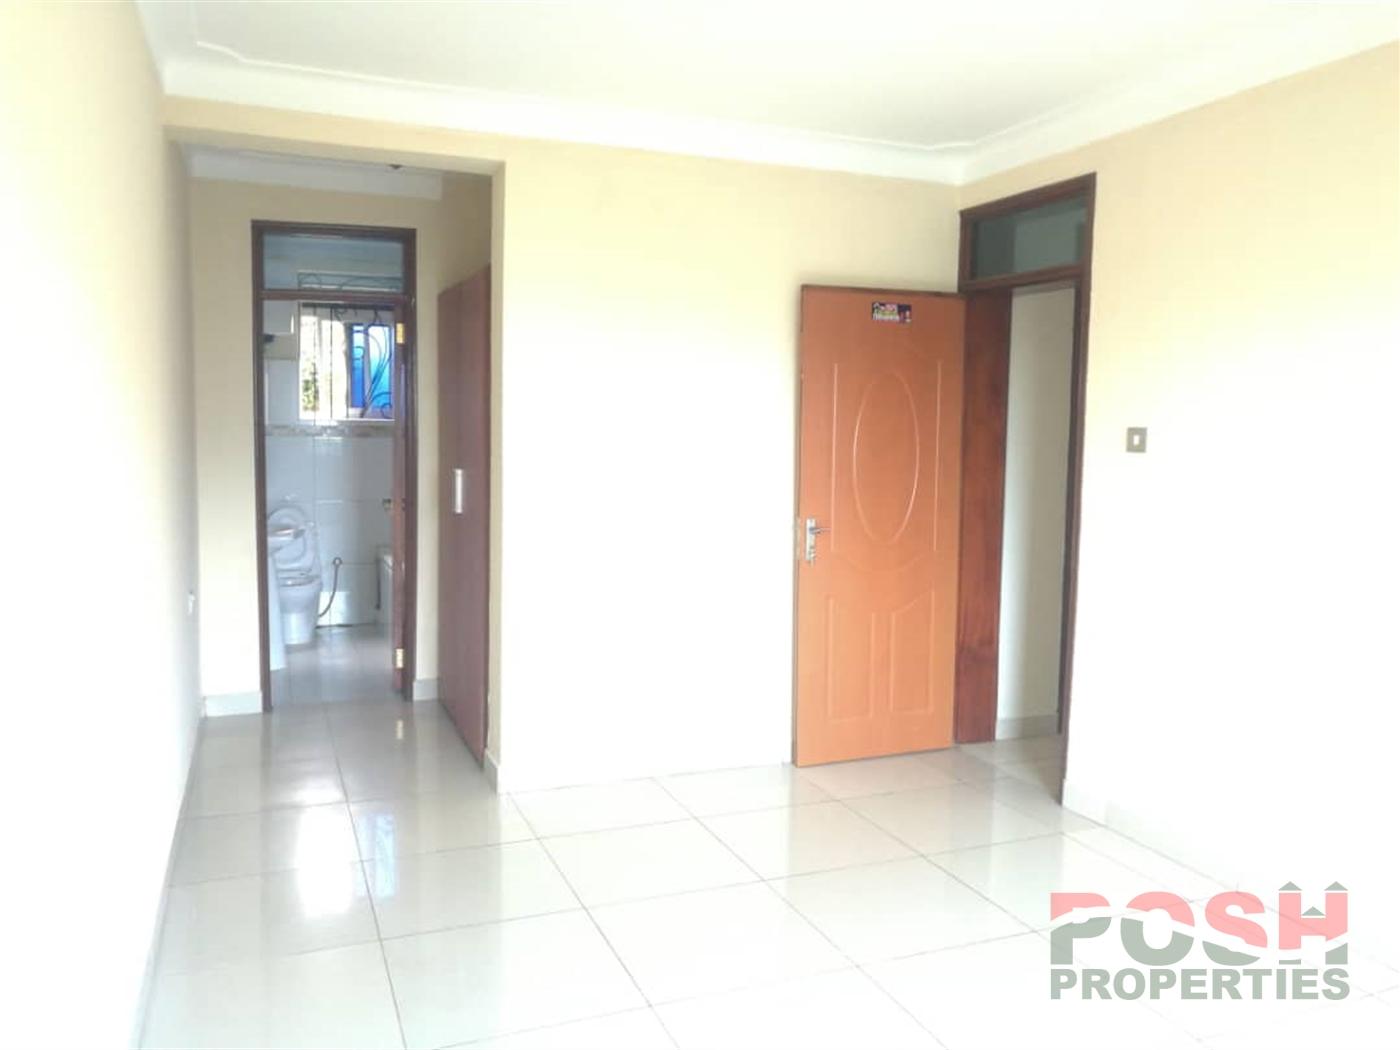 Apartment block for sale in Munyonyo Kampala